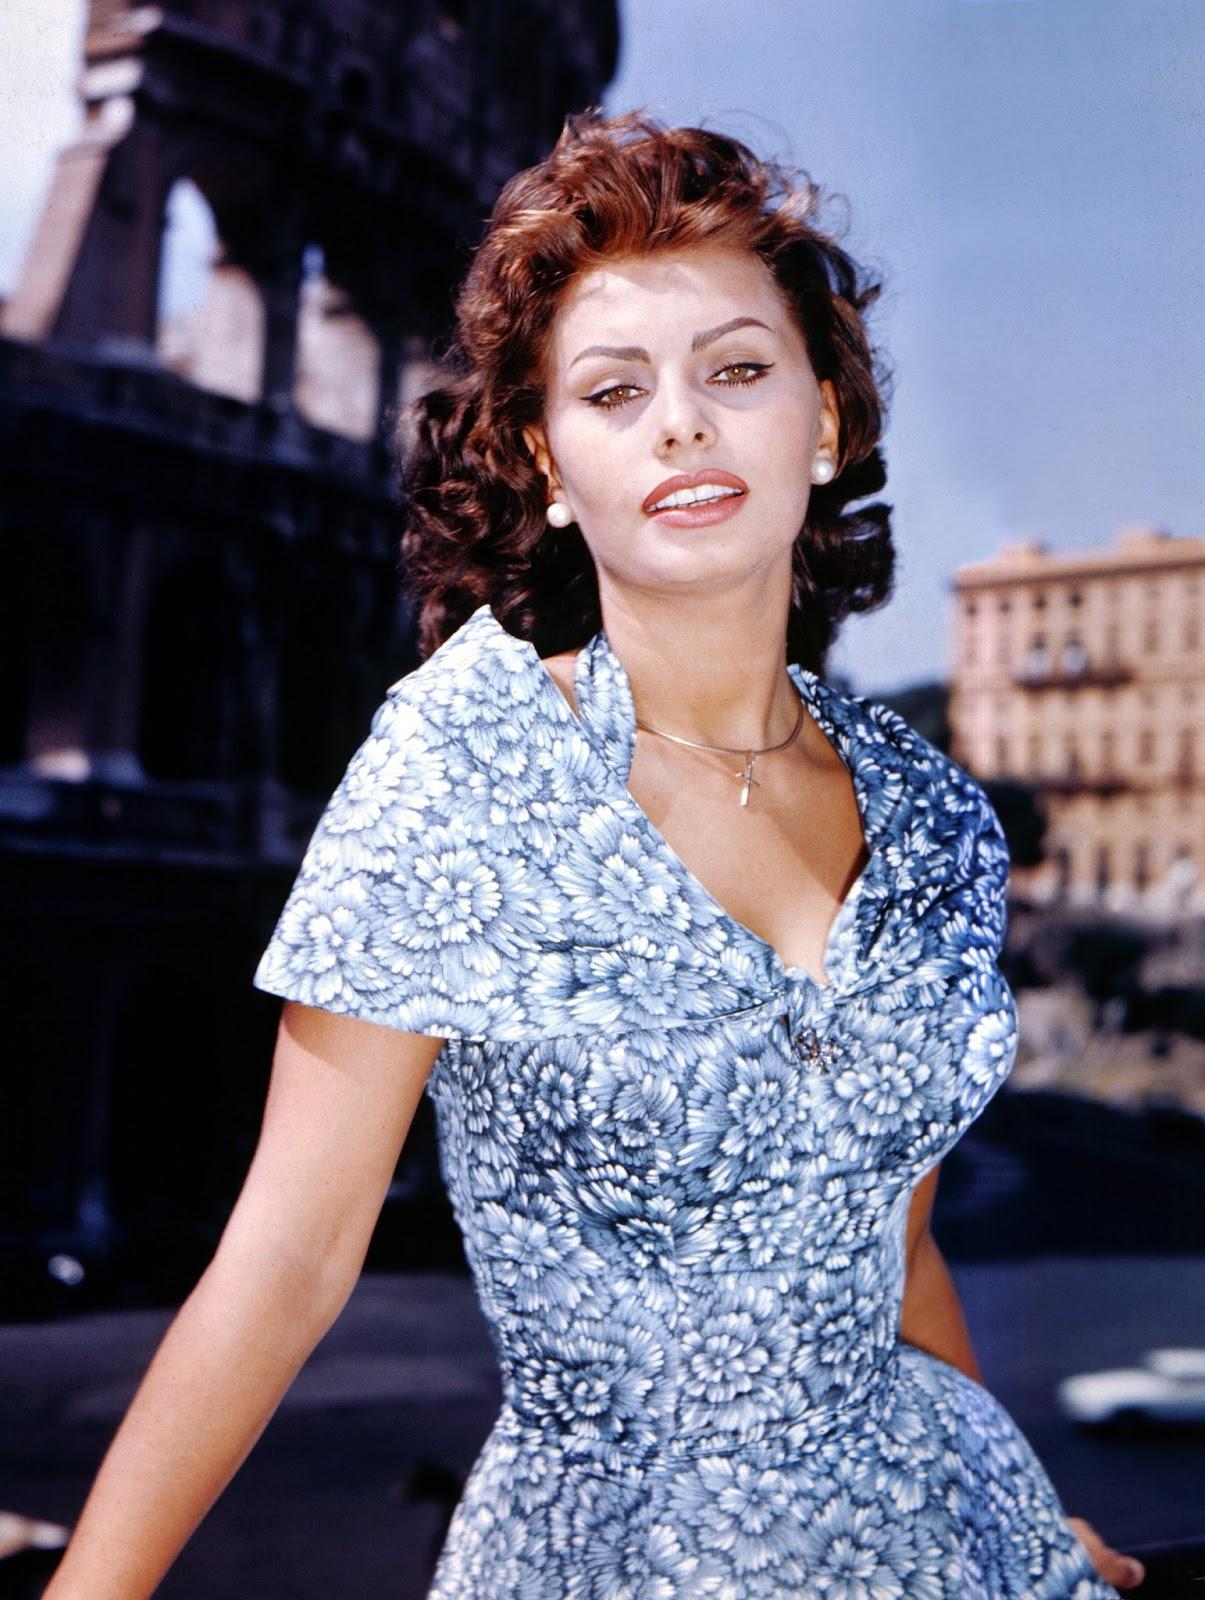 sophia loren fashion icon of the world - Sophia Loren Hair Color